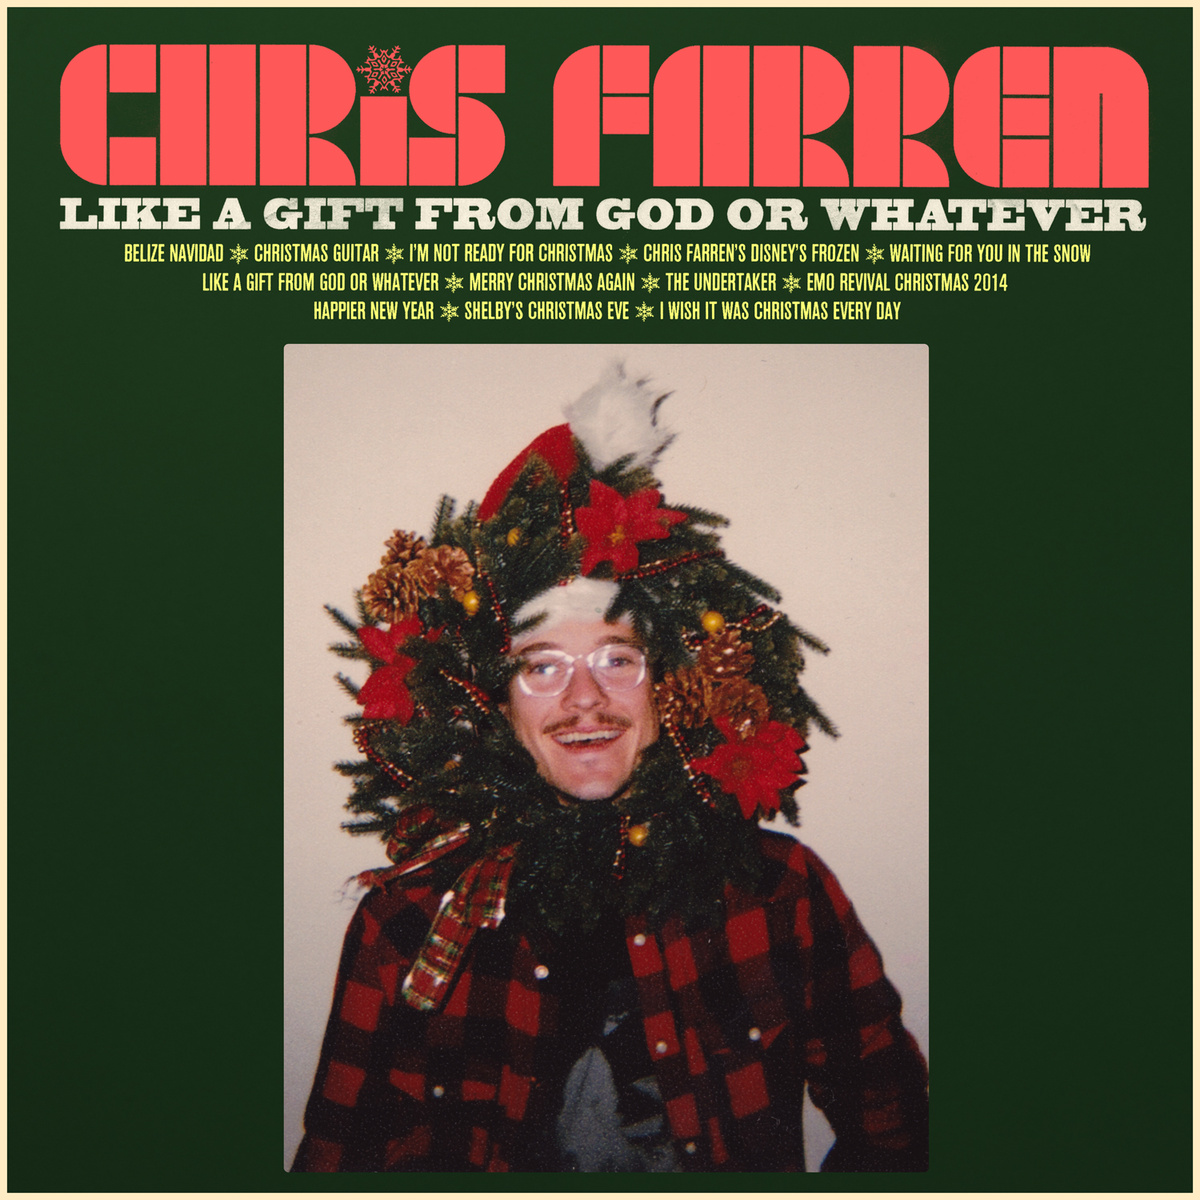 Chris Farren - Like A Gift From God or Whatever